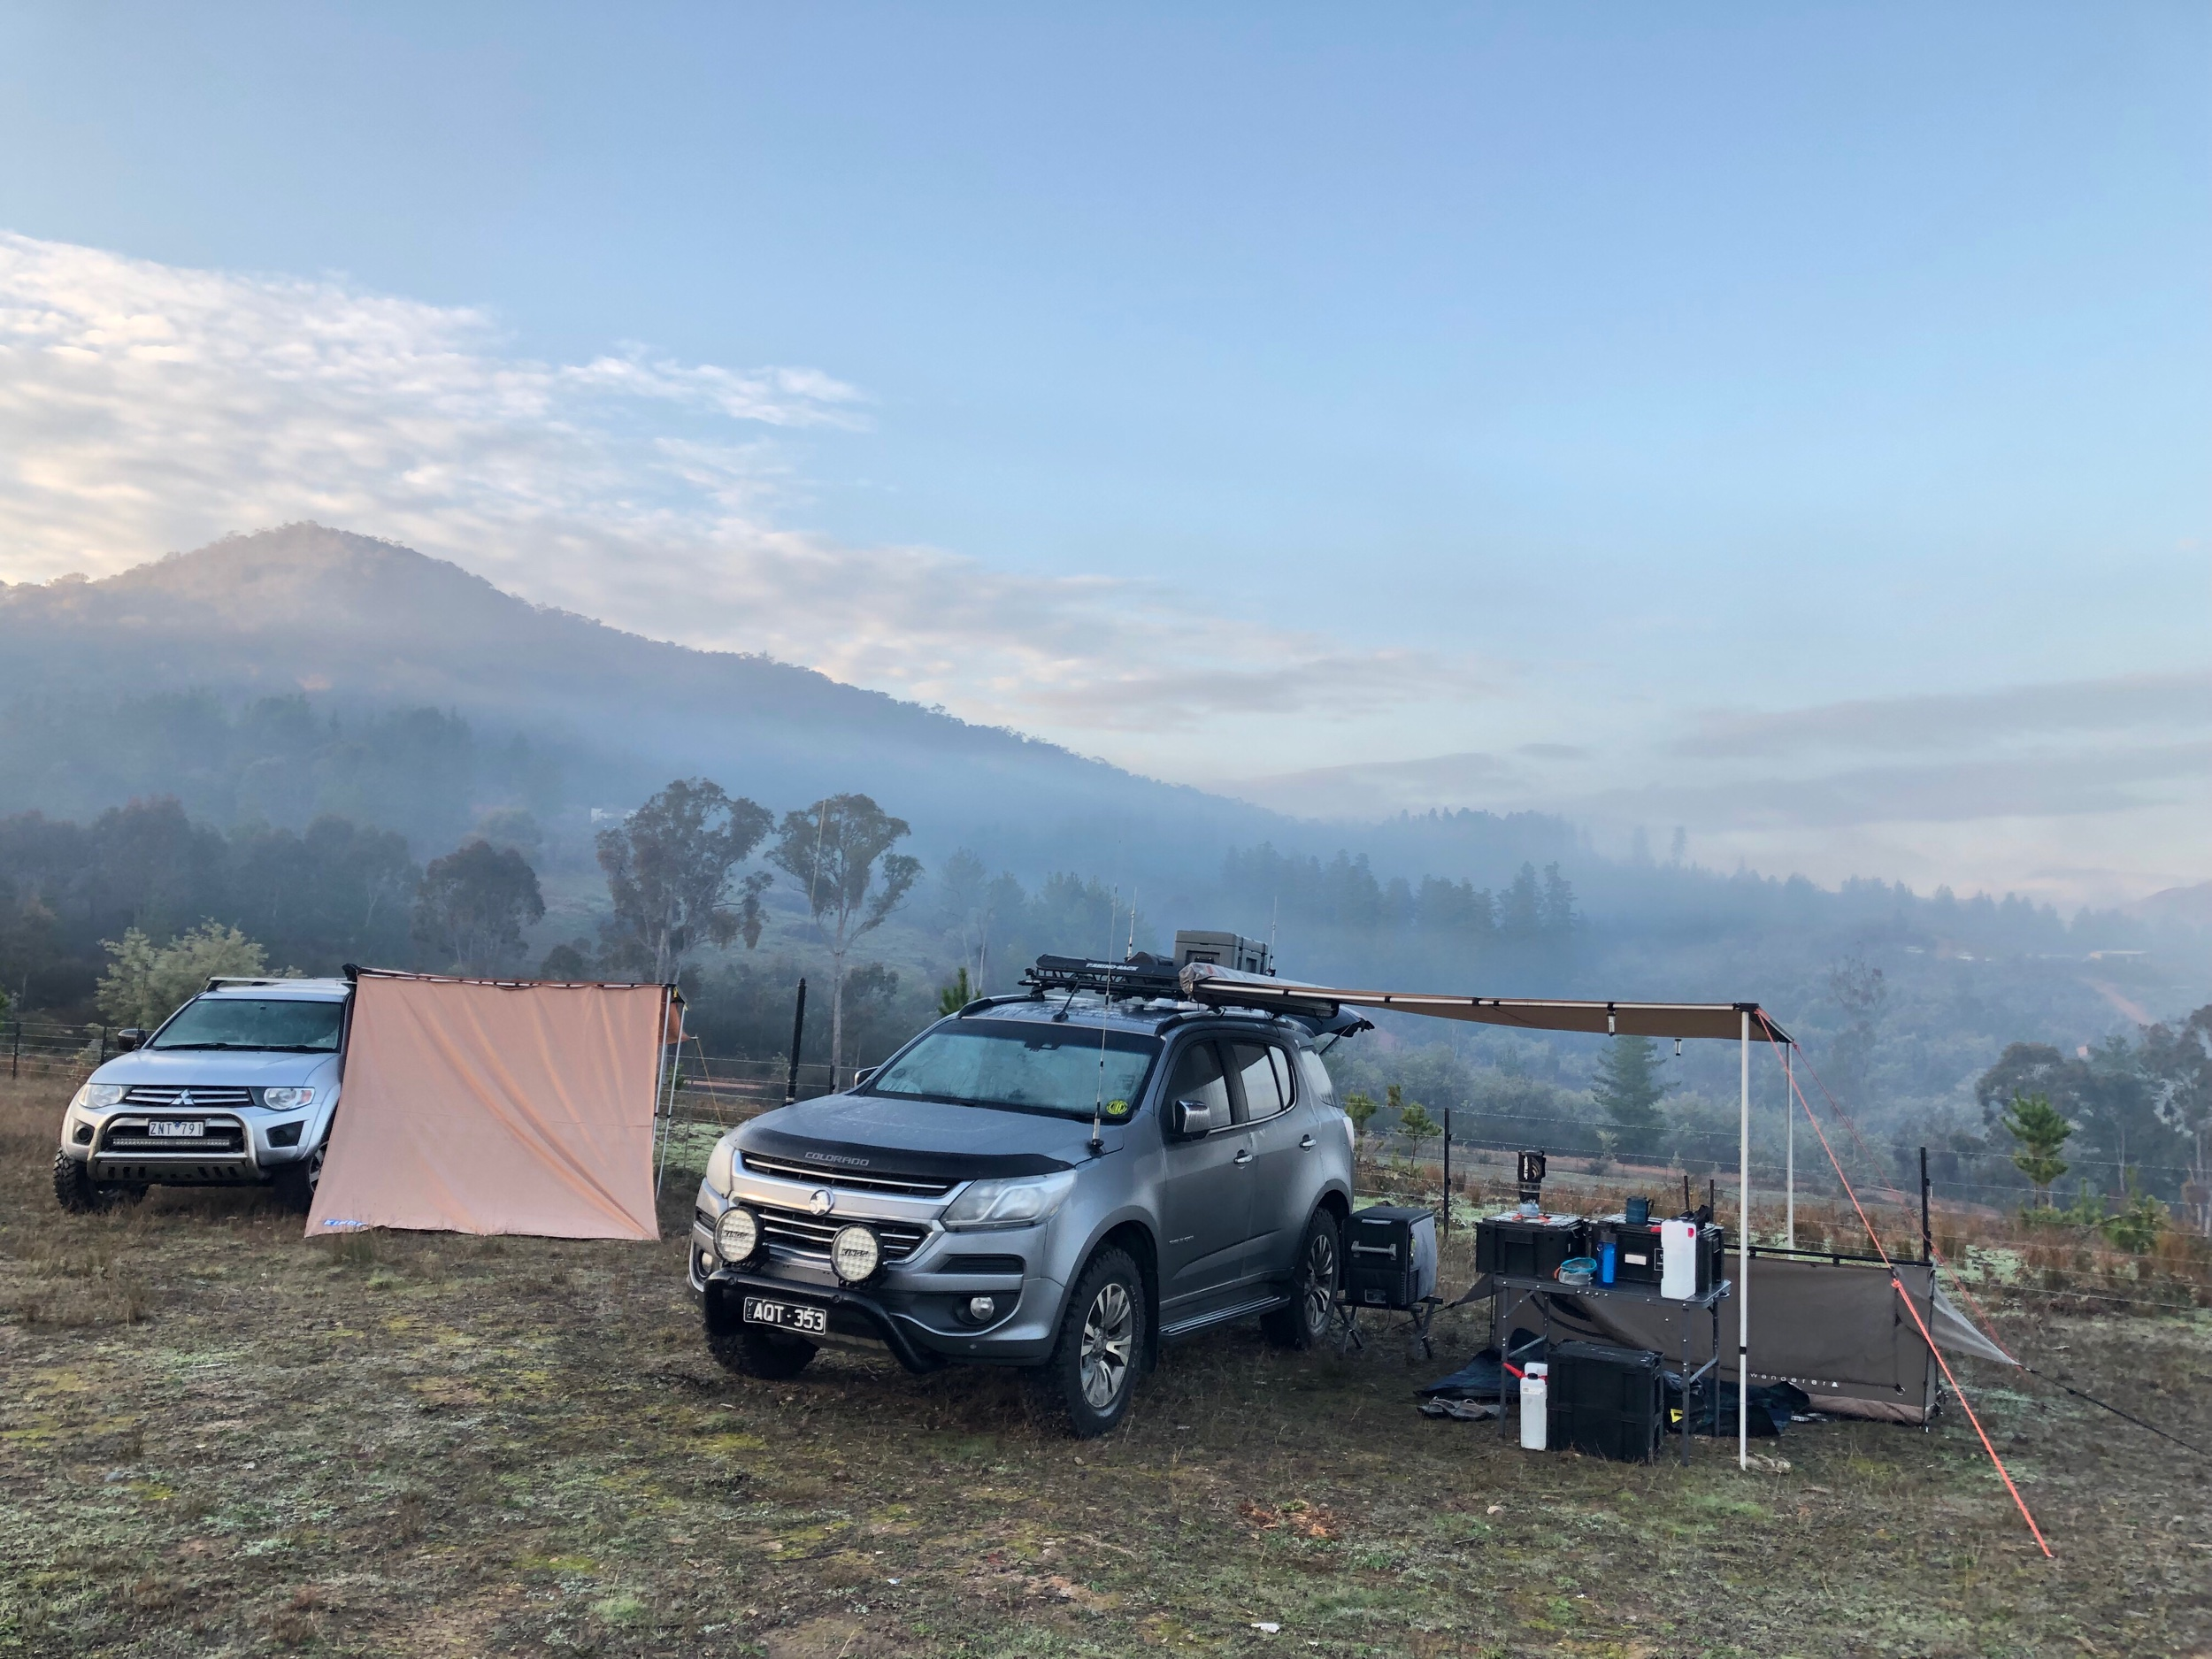 Our camp site - VK3MDH & VK3MRG